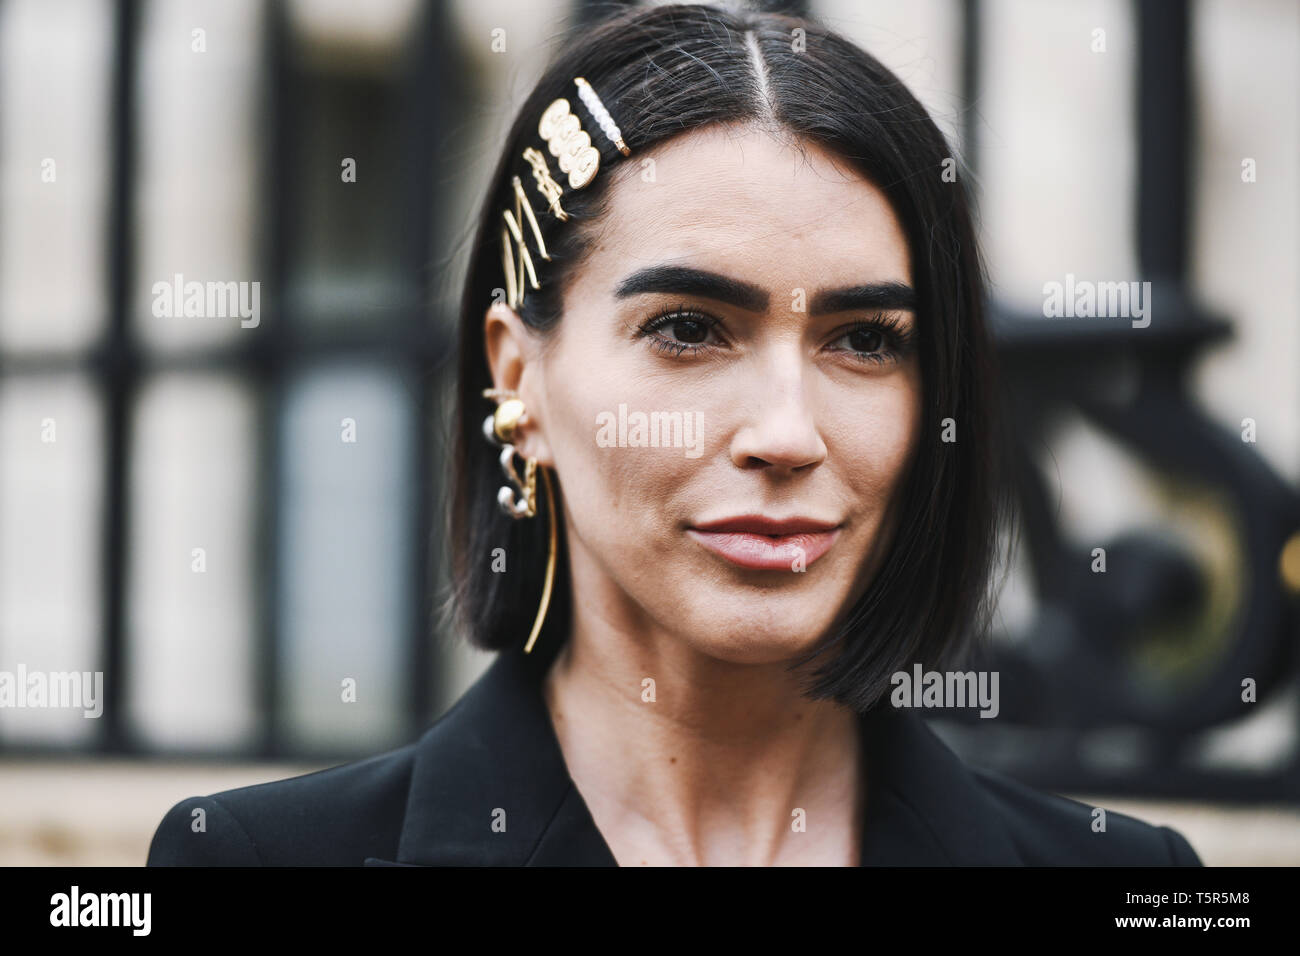 Paris, France - March 02, 2019: Model portrait after a fashion show during Paris Fashion Week - PFWFW19 - Stock Image